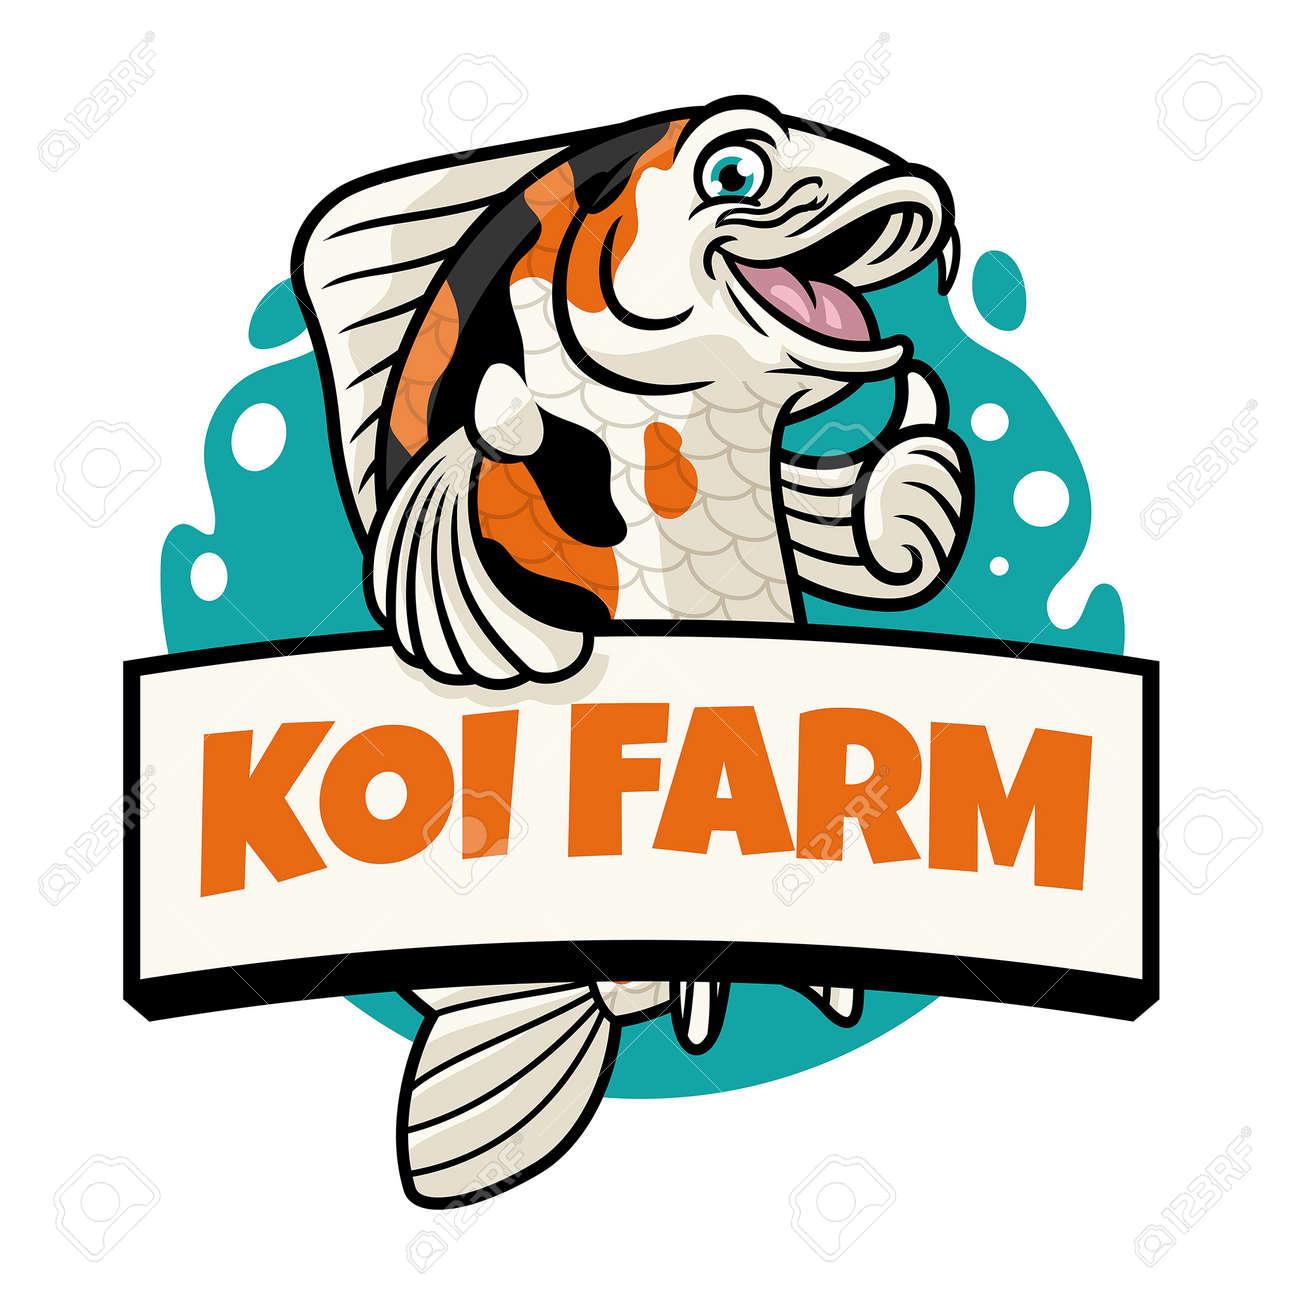 thumb up pose of cute cartoon koi fish - 163987836